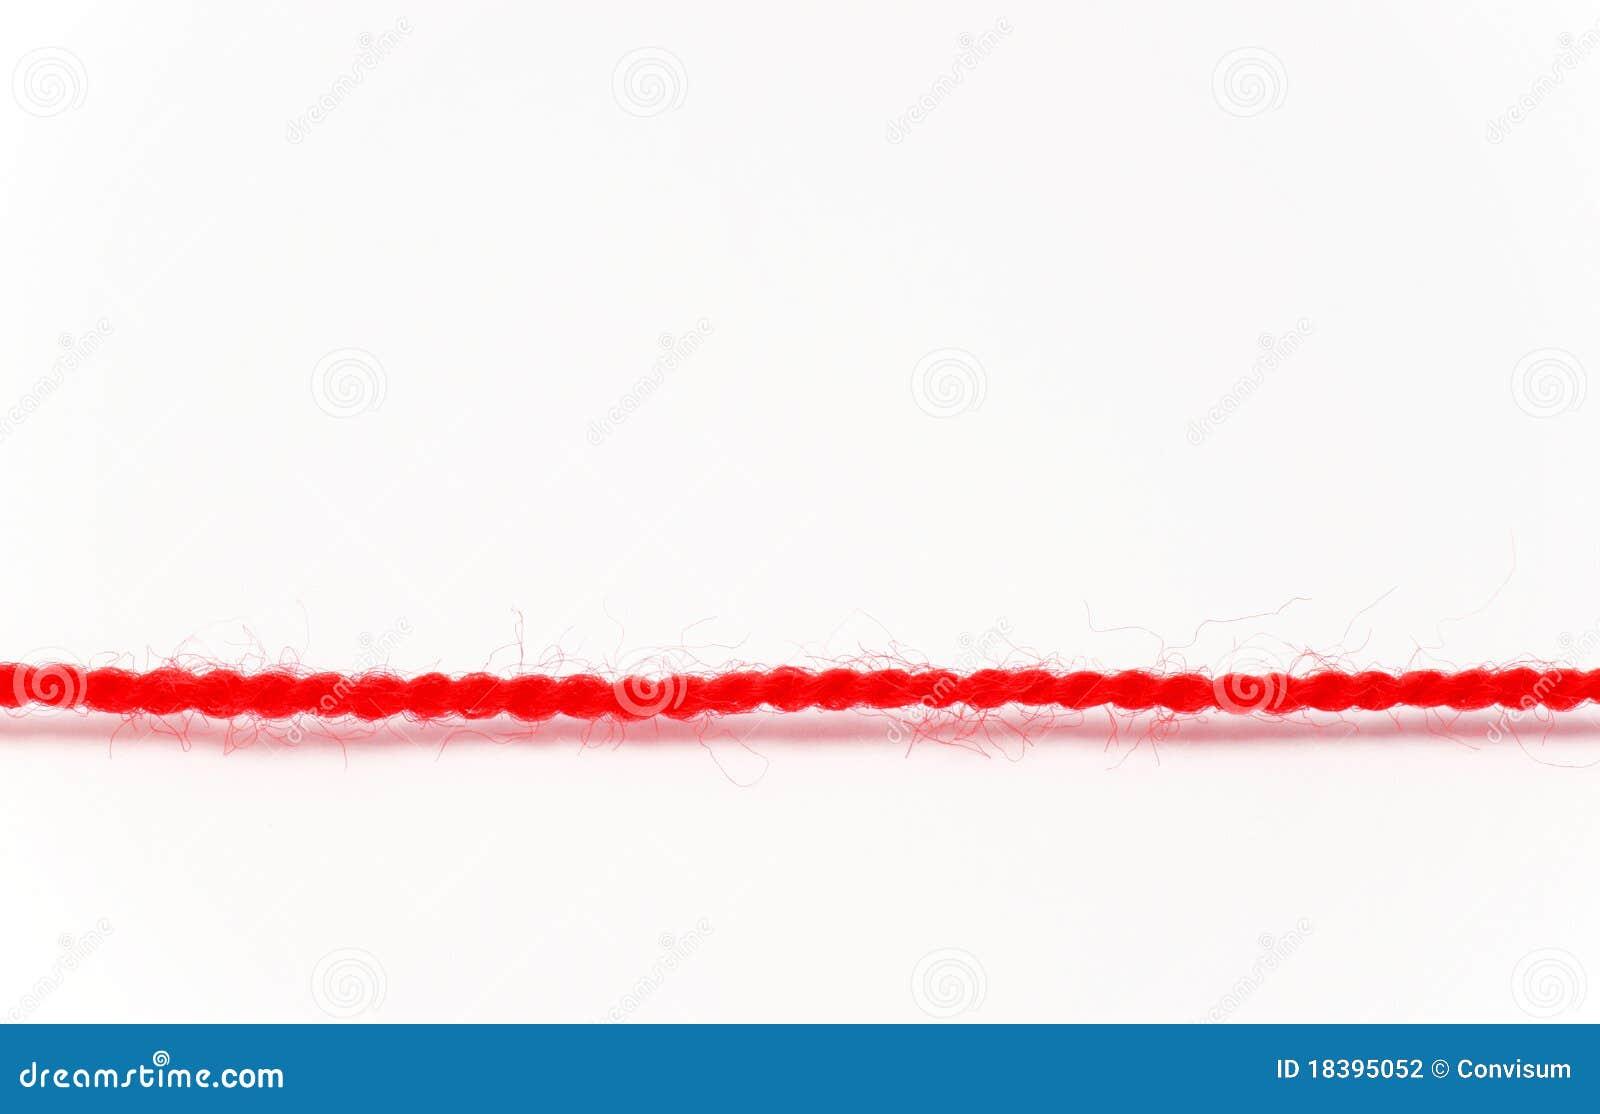 Amorçage rouge